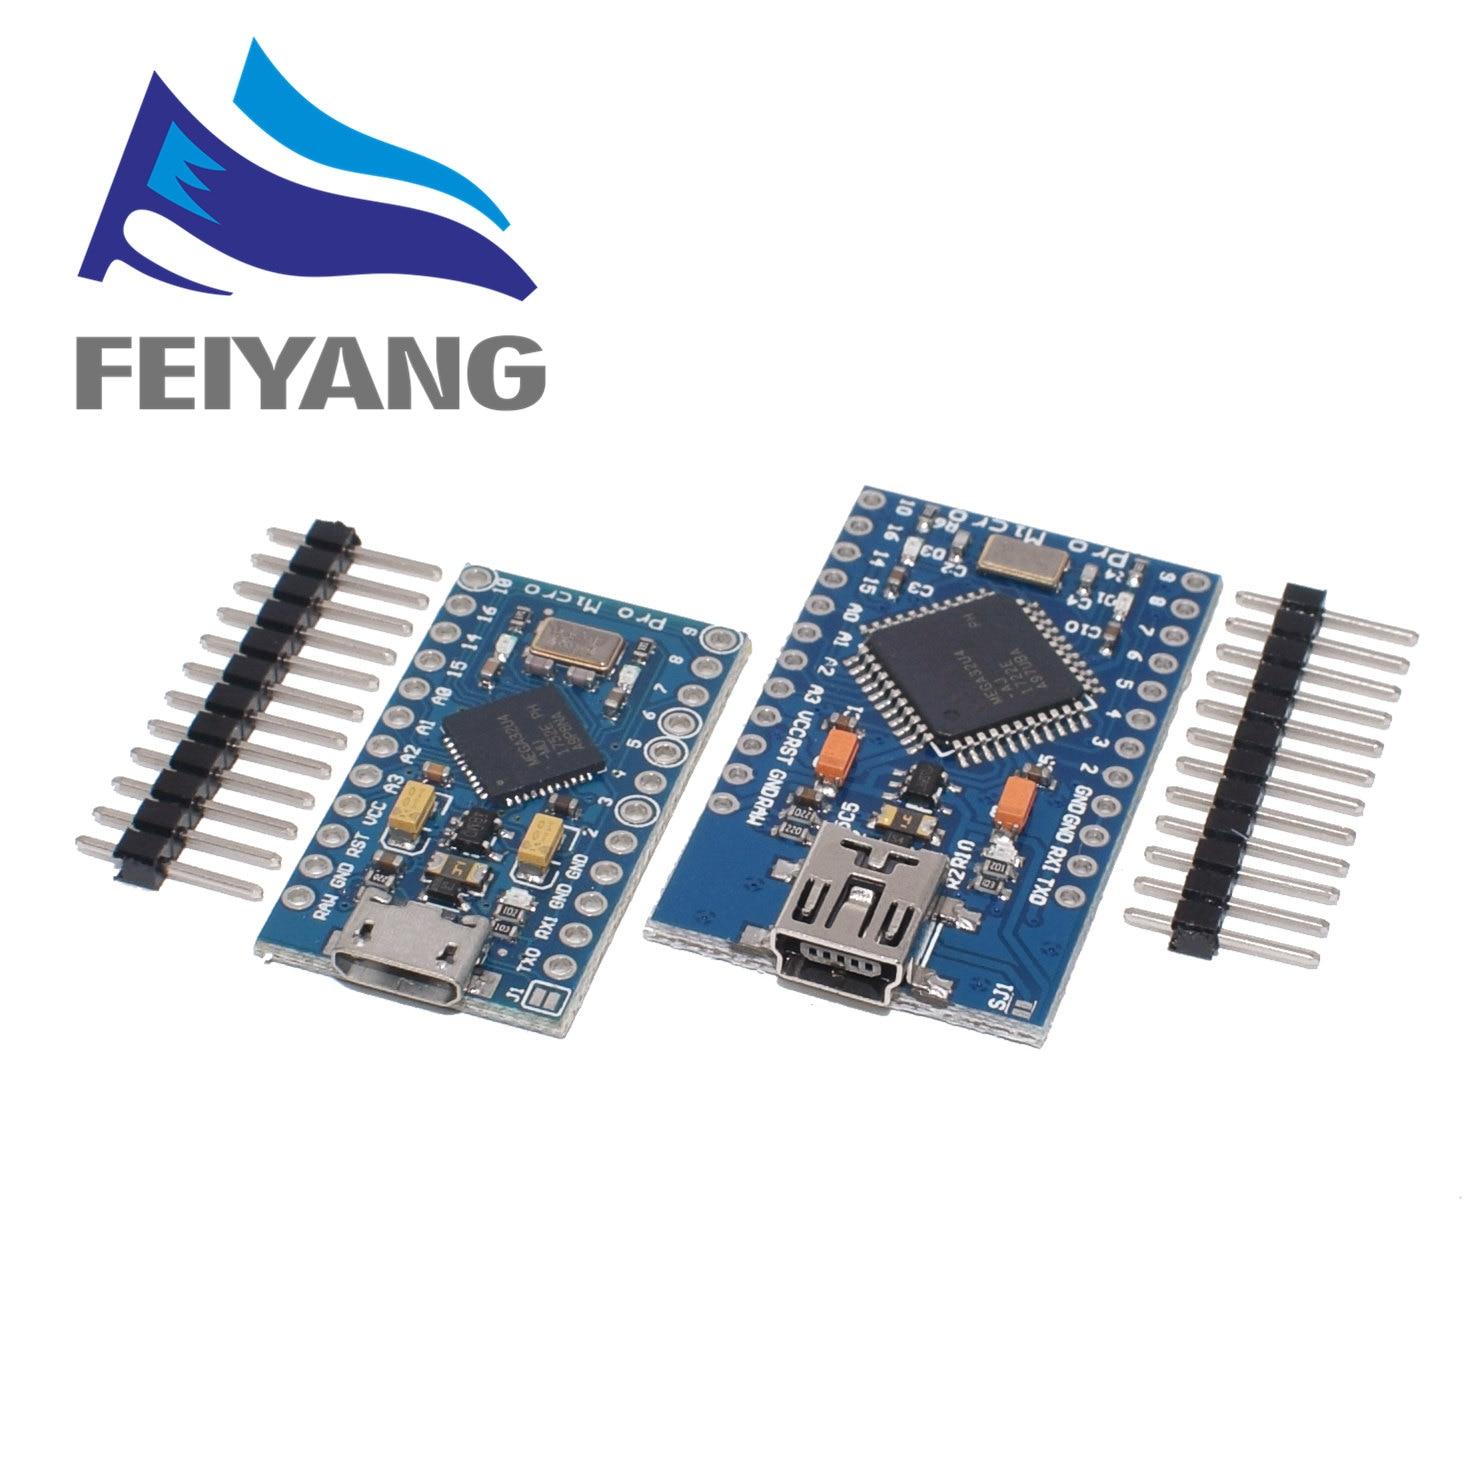 PRO MICRO/MINI USB 5V 16MHz Board Module For Arduino/Leonardo ATMEGA32U4-AU/MU Controller Pro-Micro Replace Pro Mini